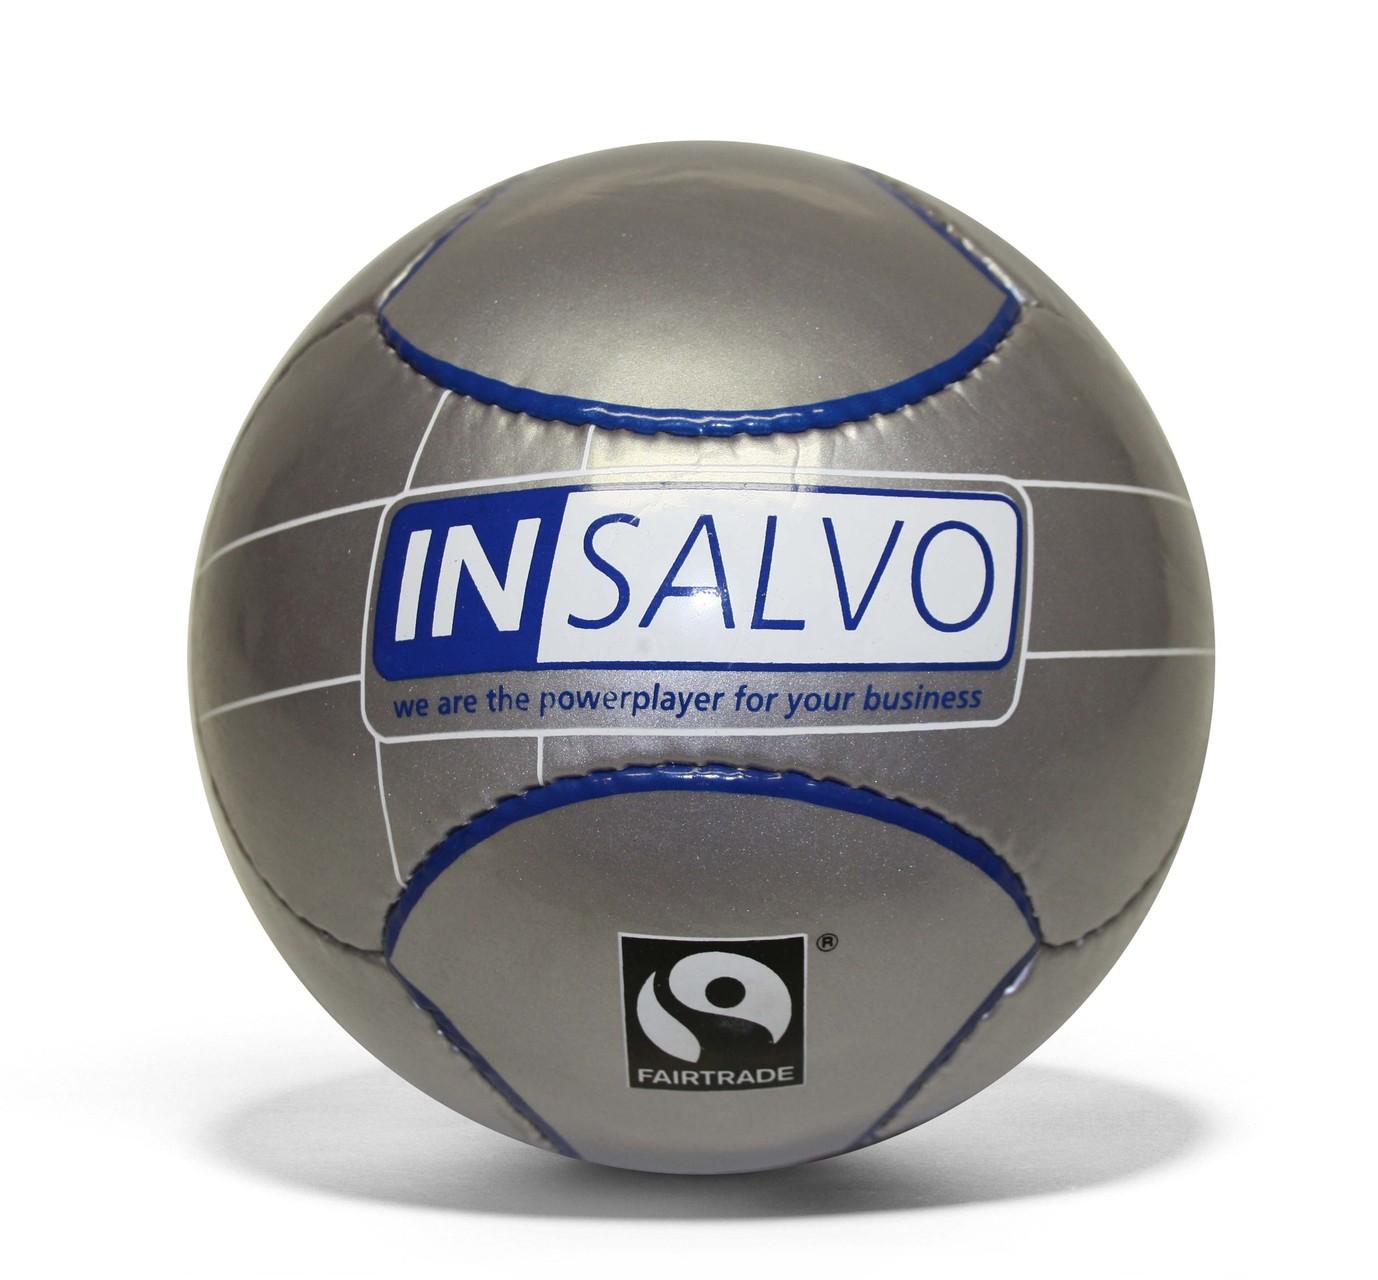 MINI CLUB - Semi-PU-Kunstleder, Durchmesser ca. 15cm - Give-Away Promotionball für INSALVO